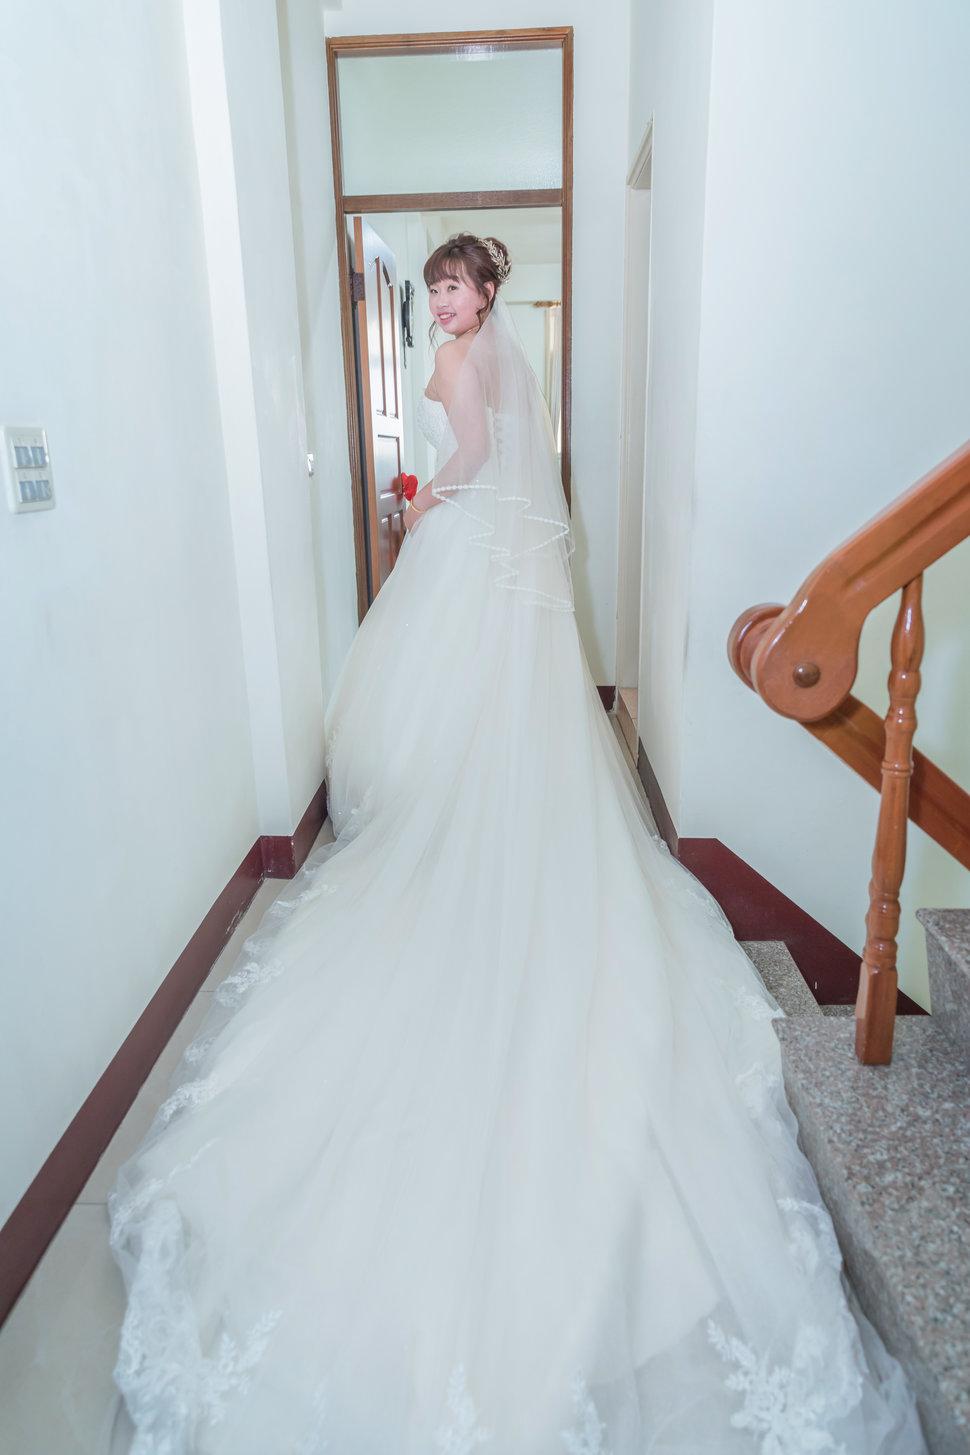 5D4_1812 - Promaker婚禮紀錄攝影團隊婚攝豪哥《結婚吧》